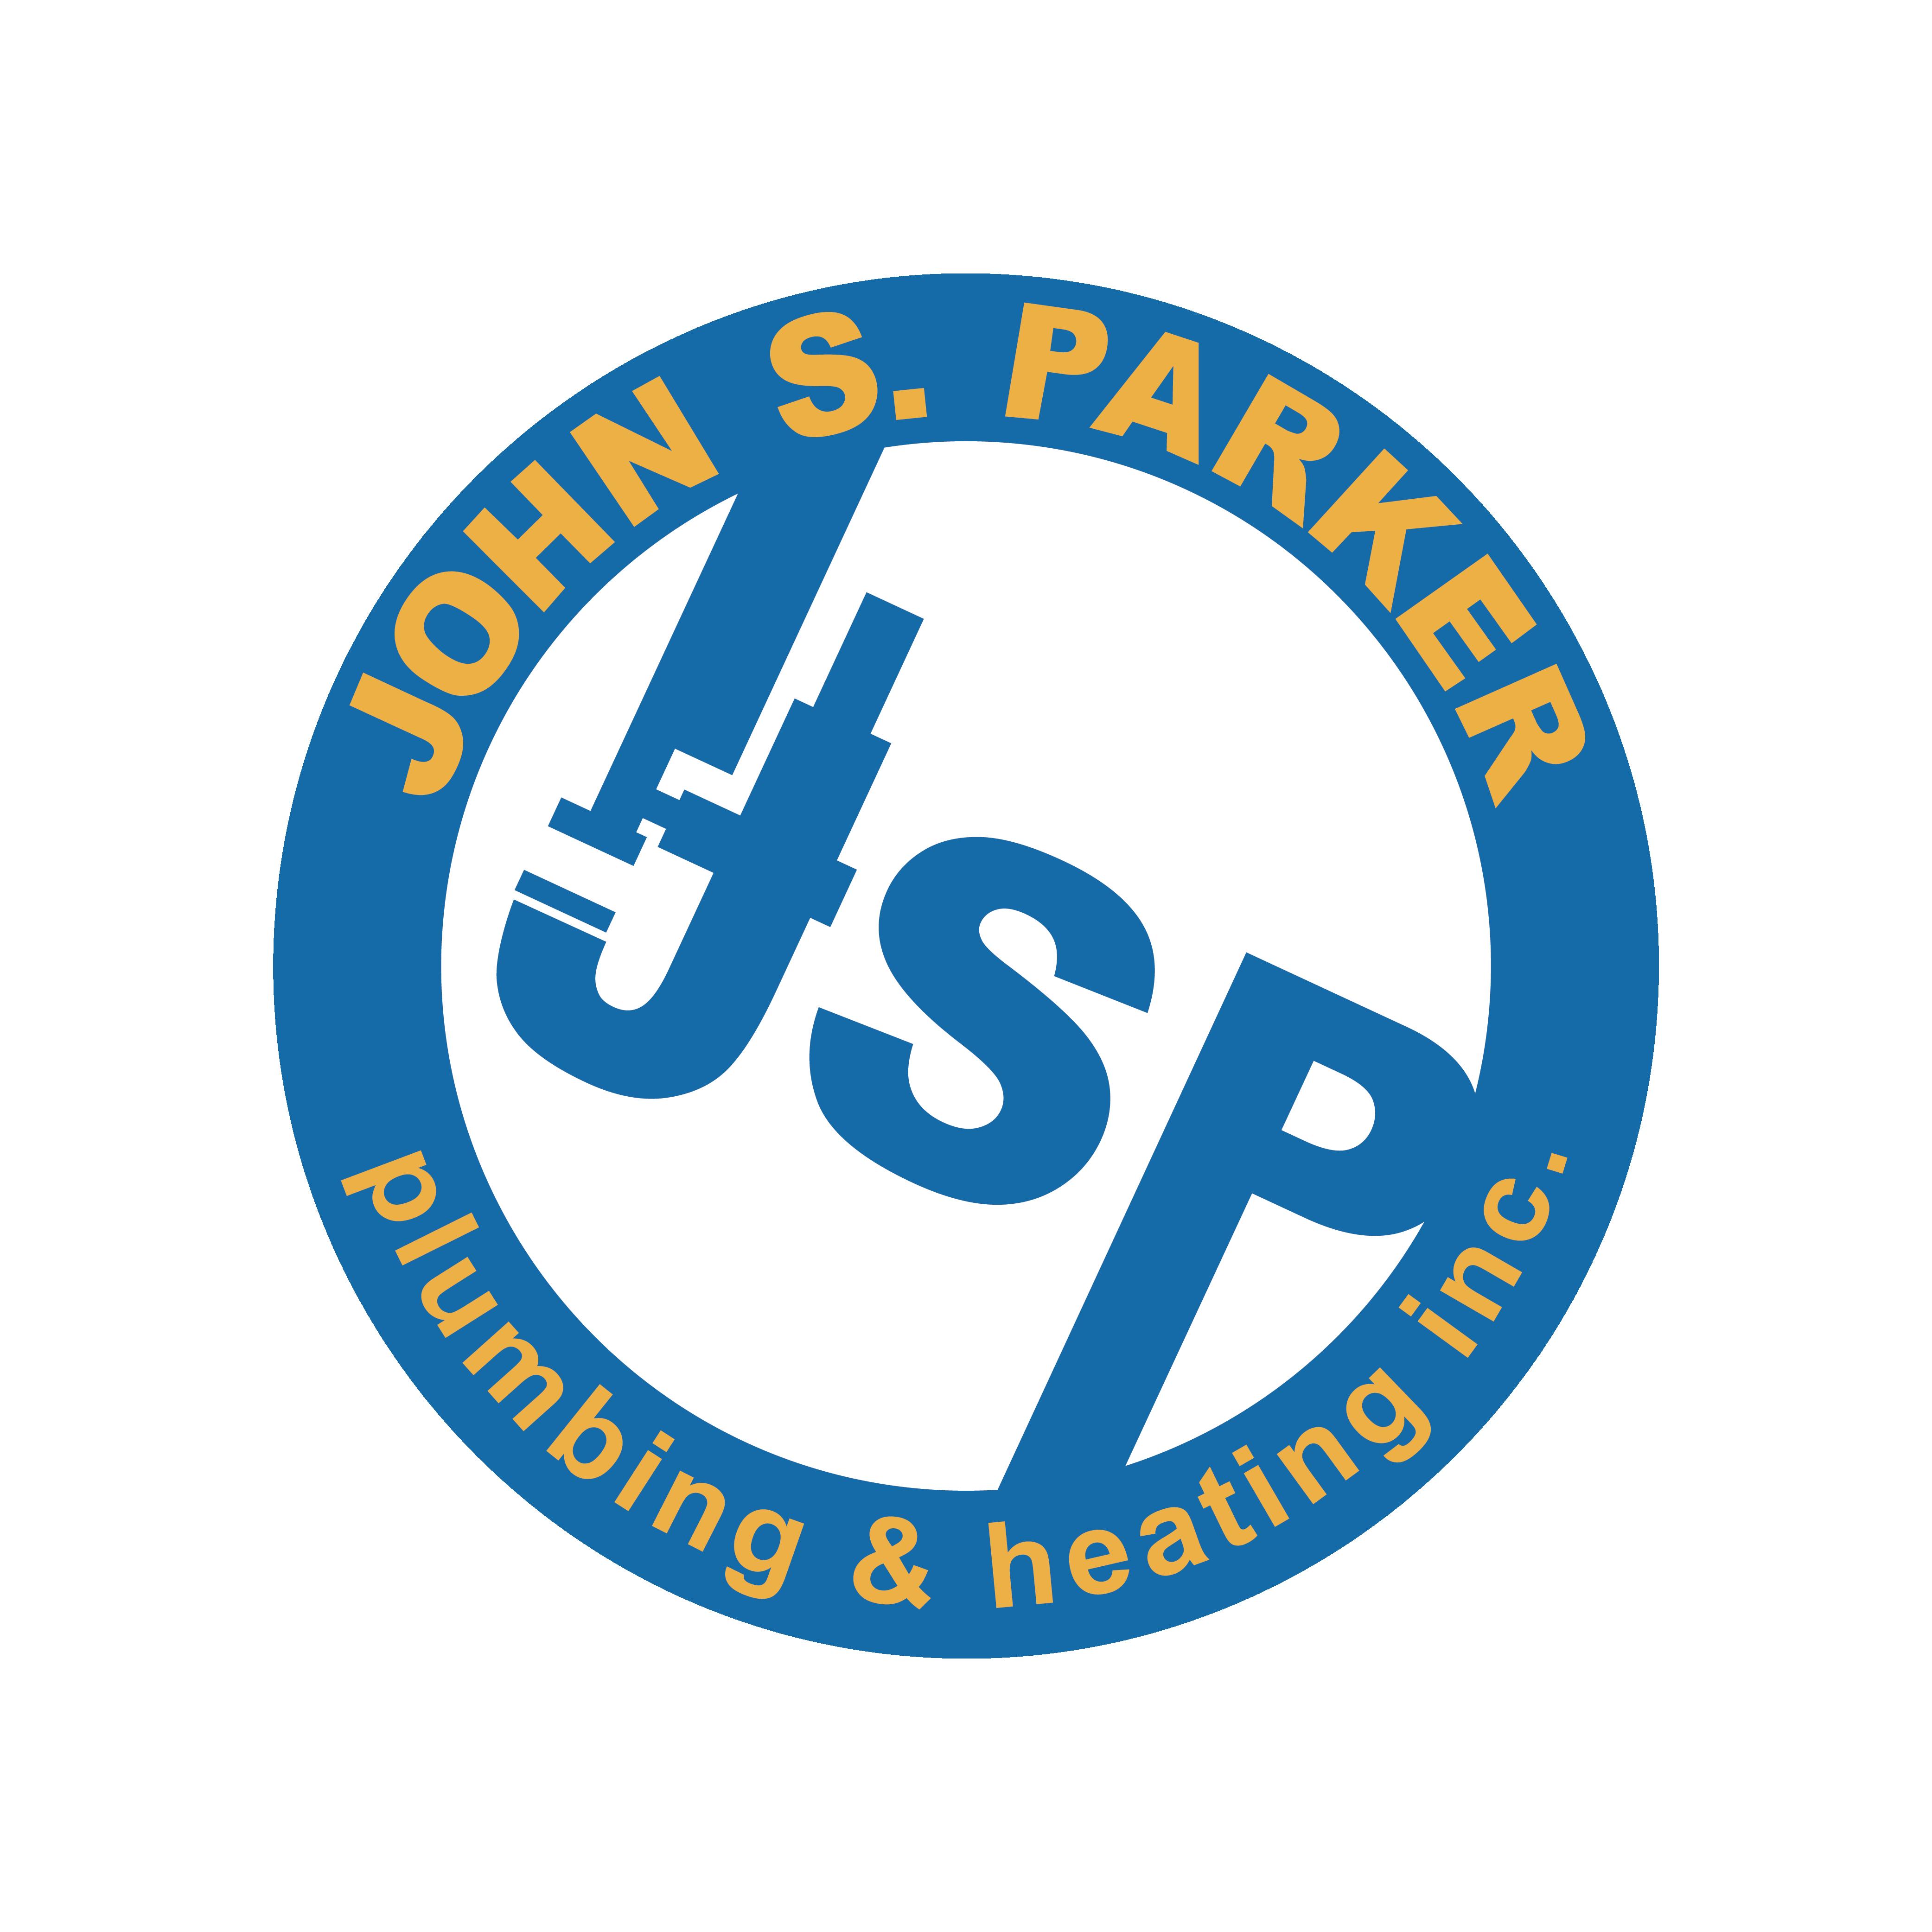 John S. Parker Plumbing & heating Inc. Logo